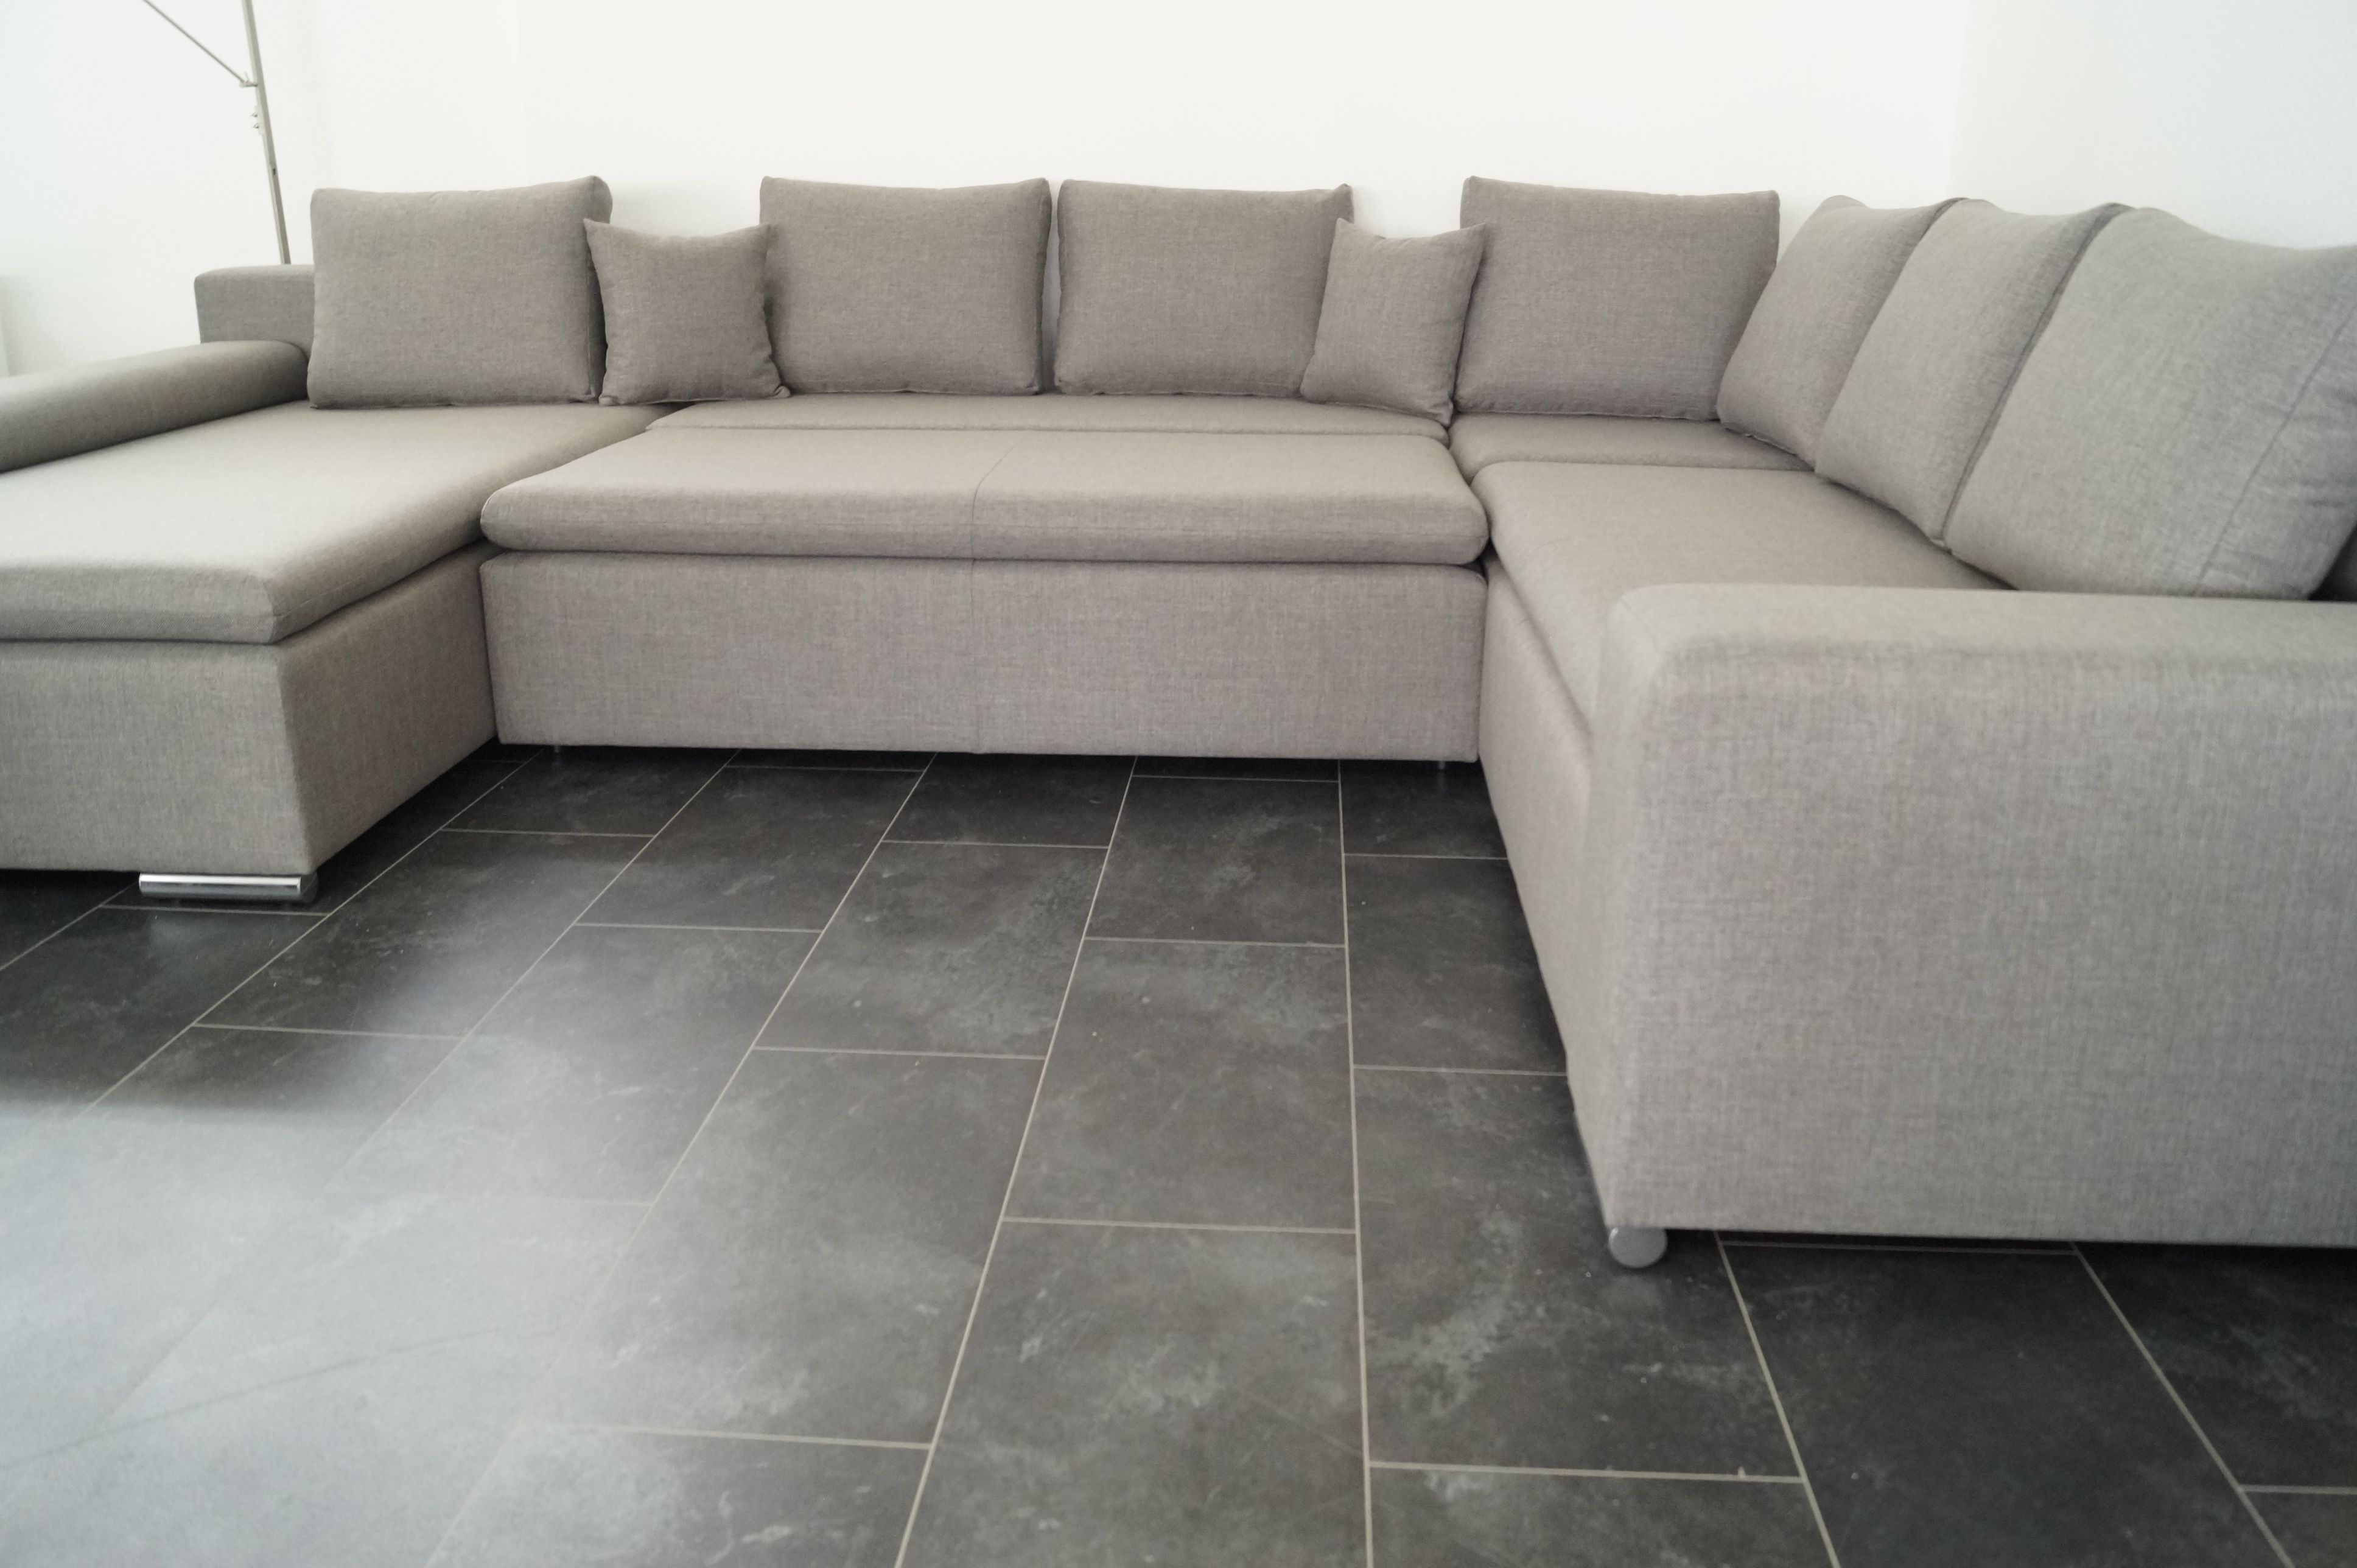 Top Ergebnis 50 Elegant Mega Couch Xxl Bild 2018 Zat3 2017